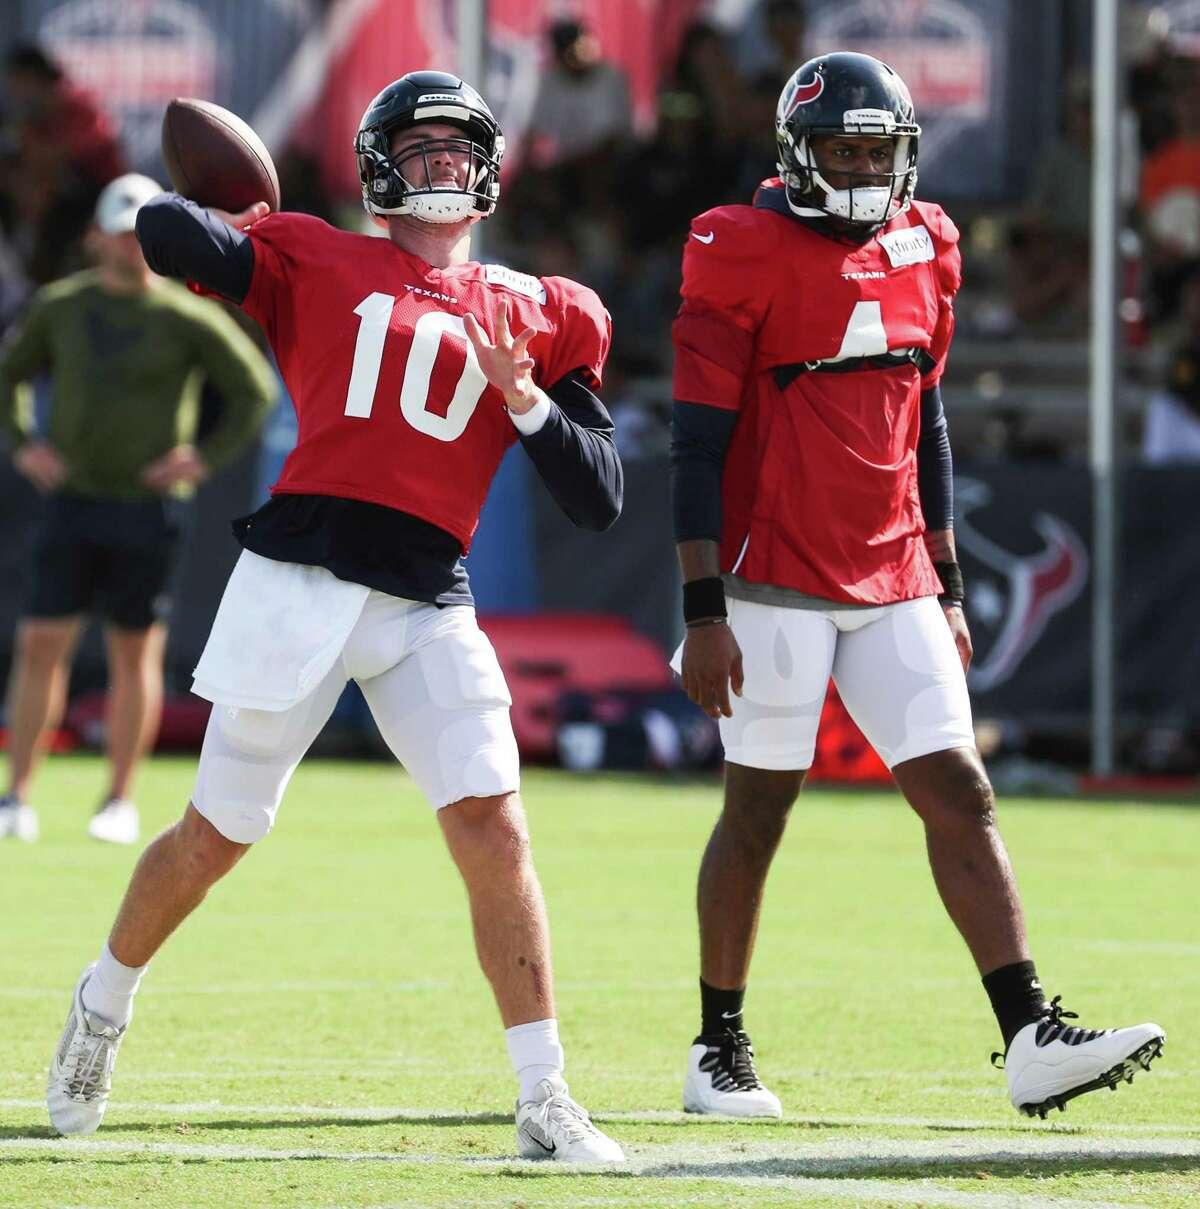 Houston Texans quarterback Davis Mills (10) throws a pass while working with quarterback Deshaun Watson (4) during an NFL training camp football practice Monday, Aug. 9, 2021, in Houston.